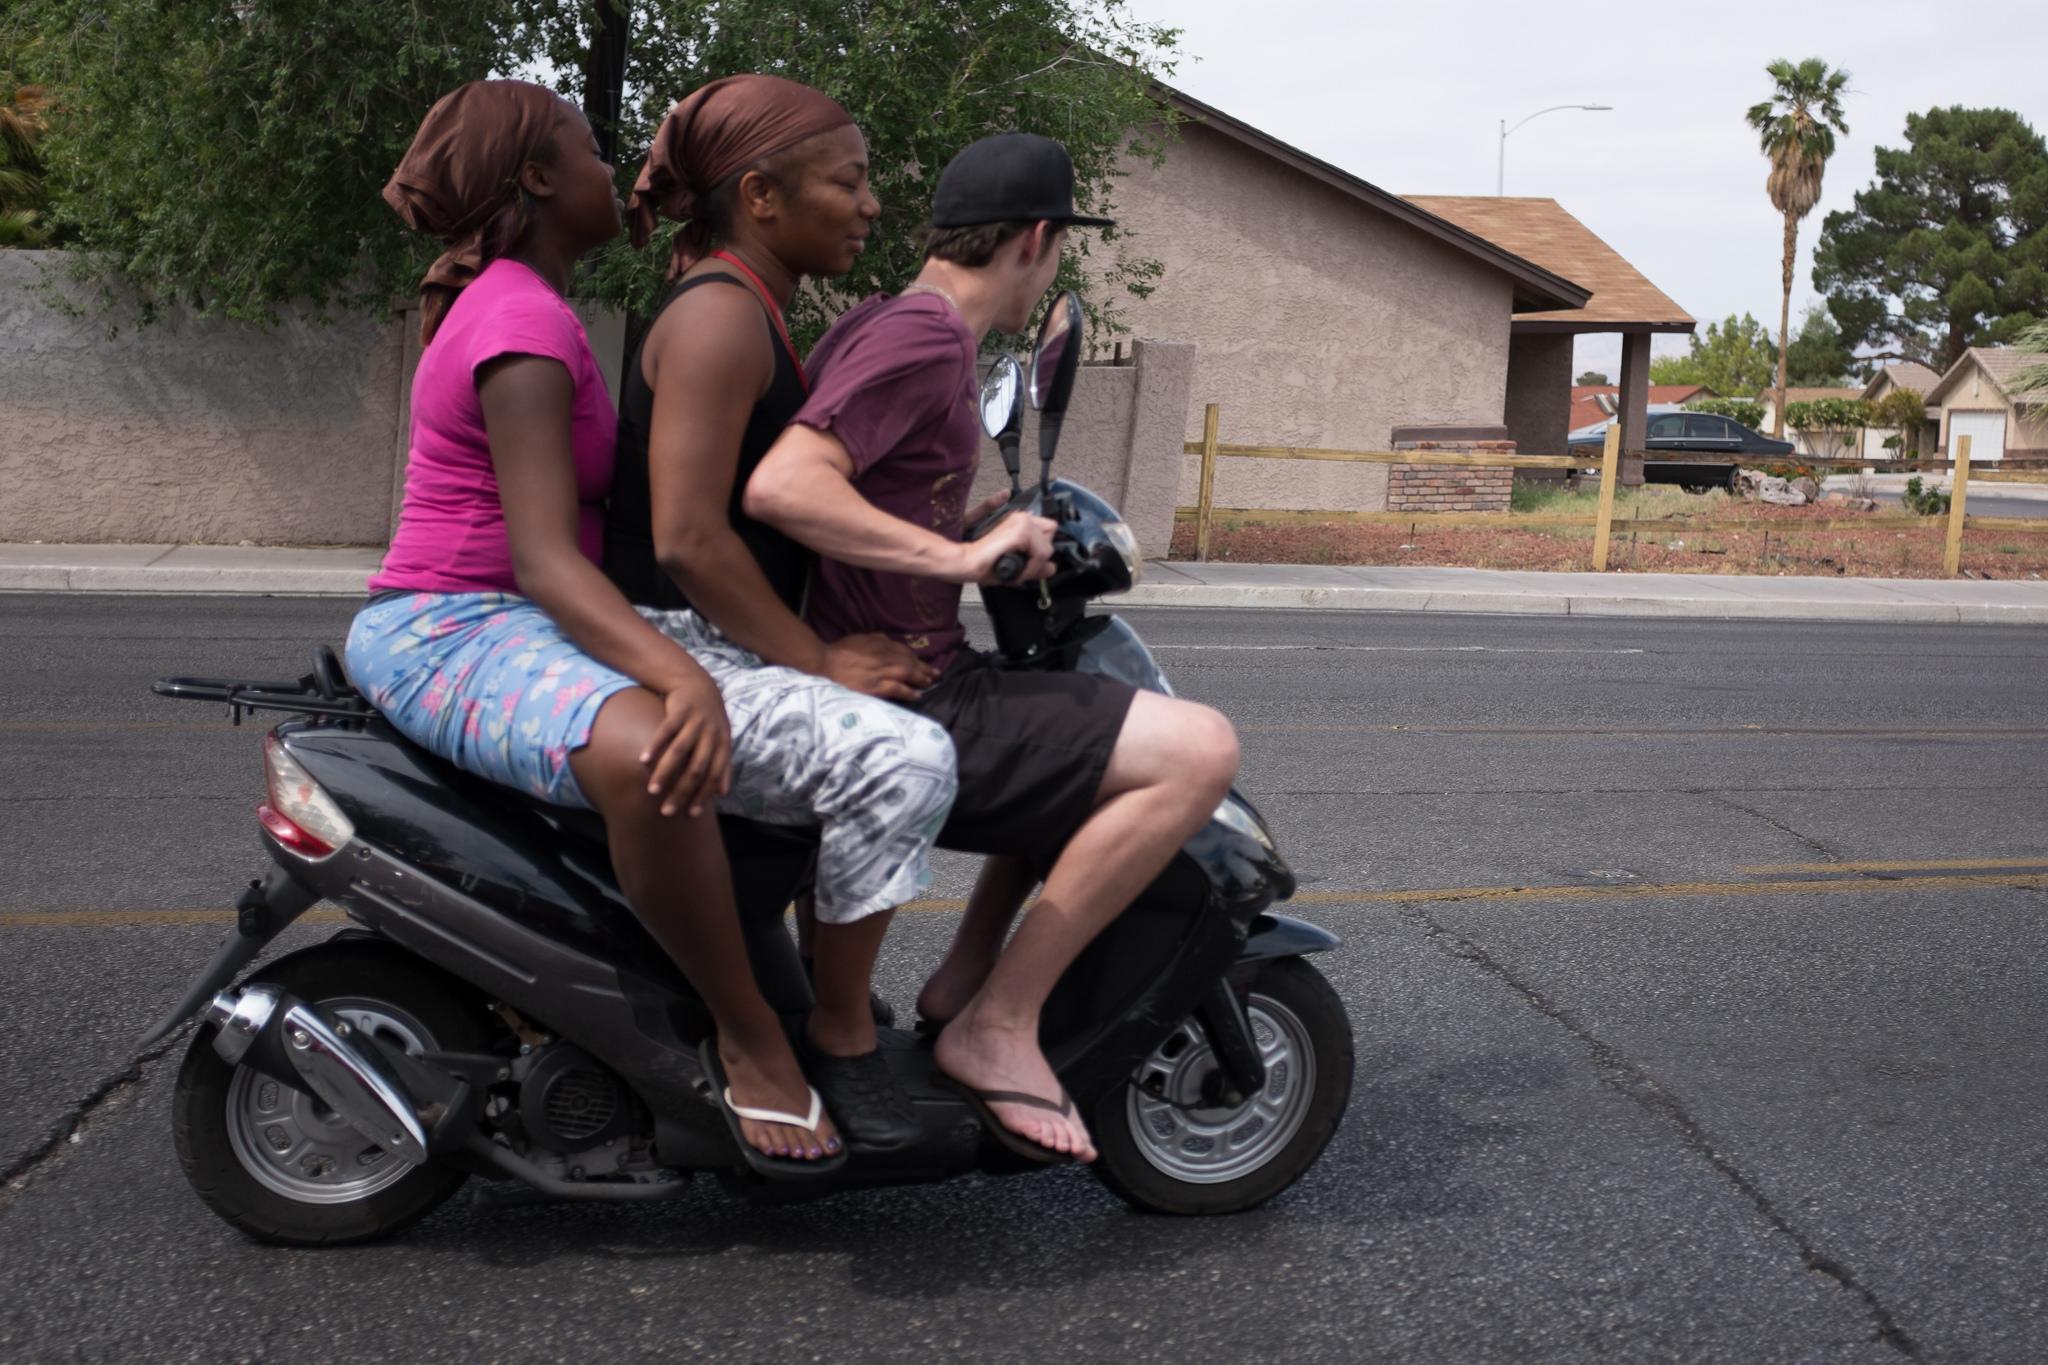 Three teens ride a moped on Washington Avenue at Woodbridge Drive in Las Vegas on Sunday, May 3, 2015.